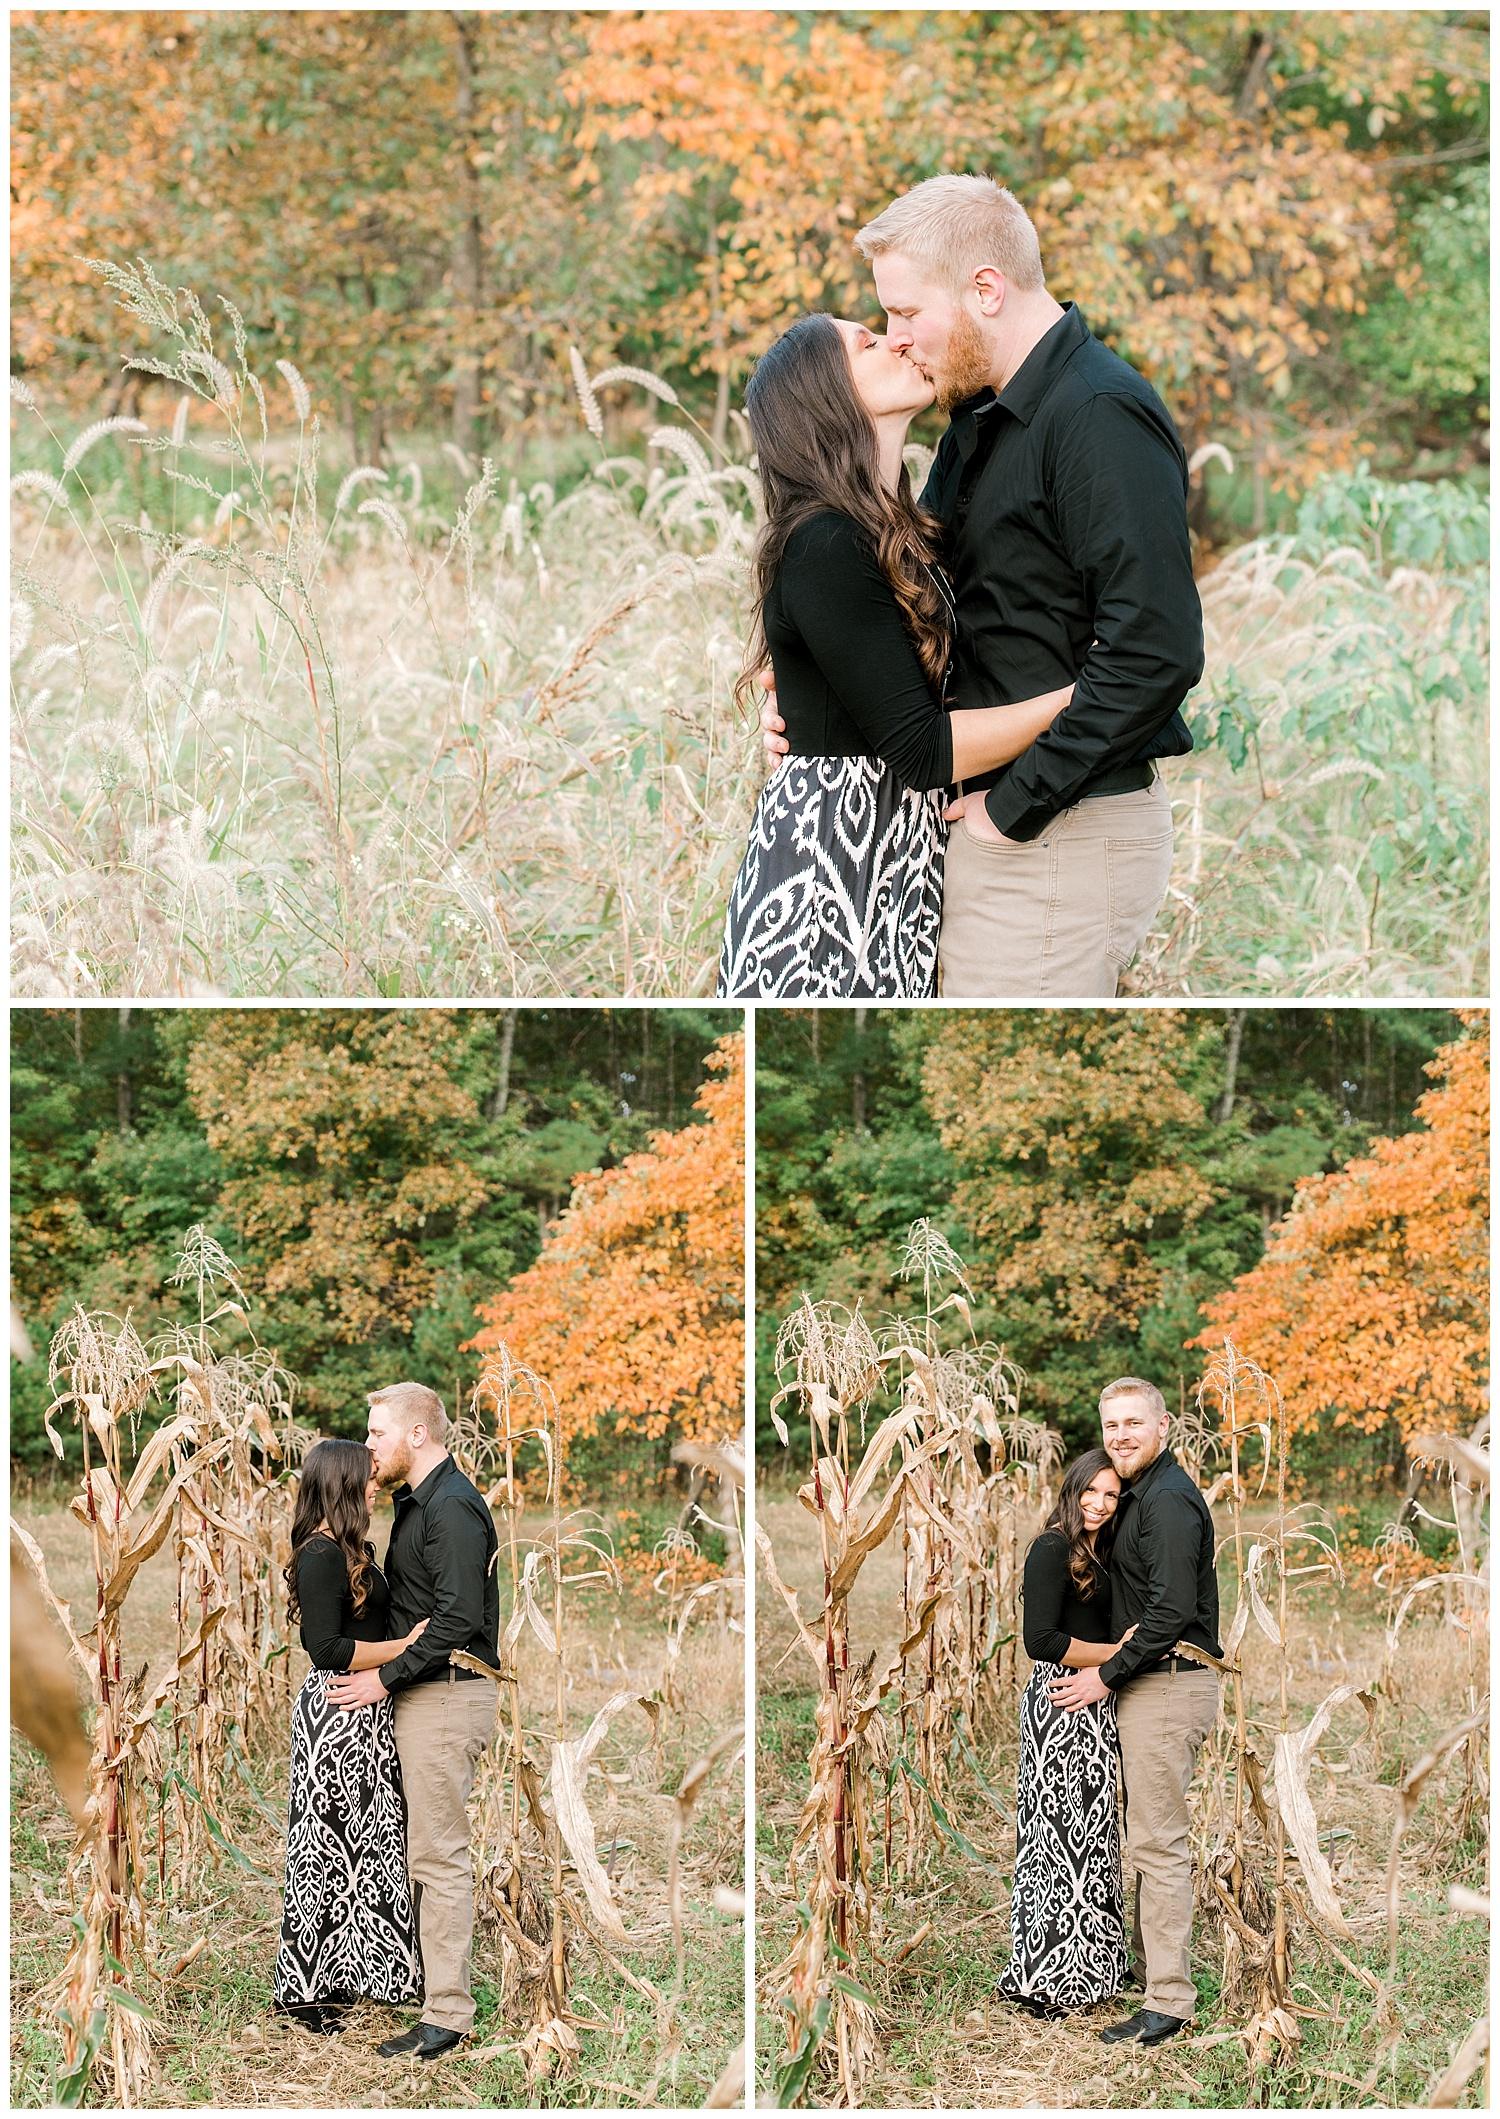 october18-connecticut-engagement-photography-rustic-farm-4.jpg